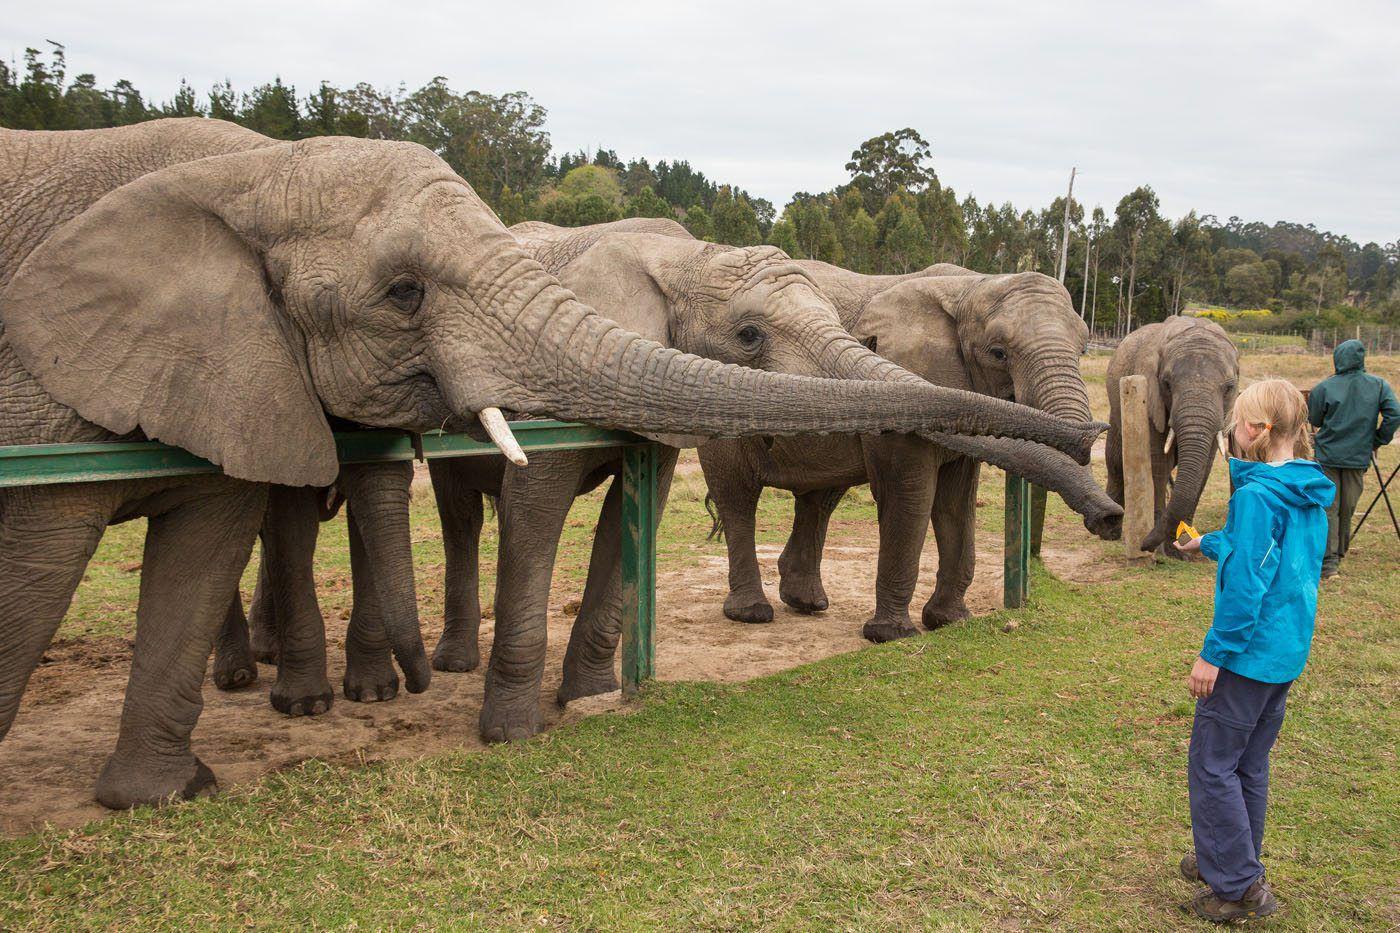 Feeding Elephants South Africa